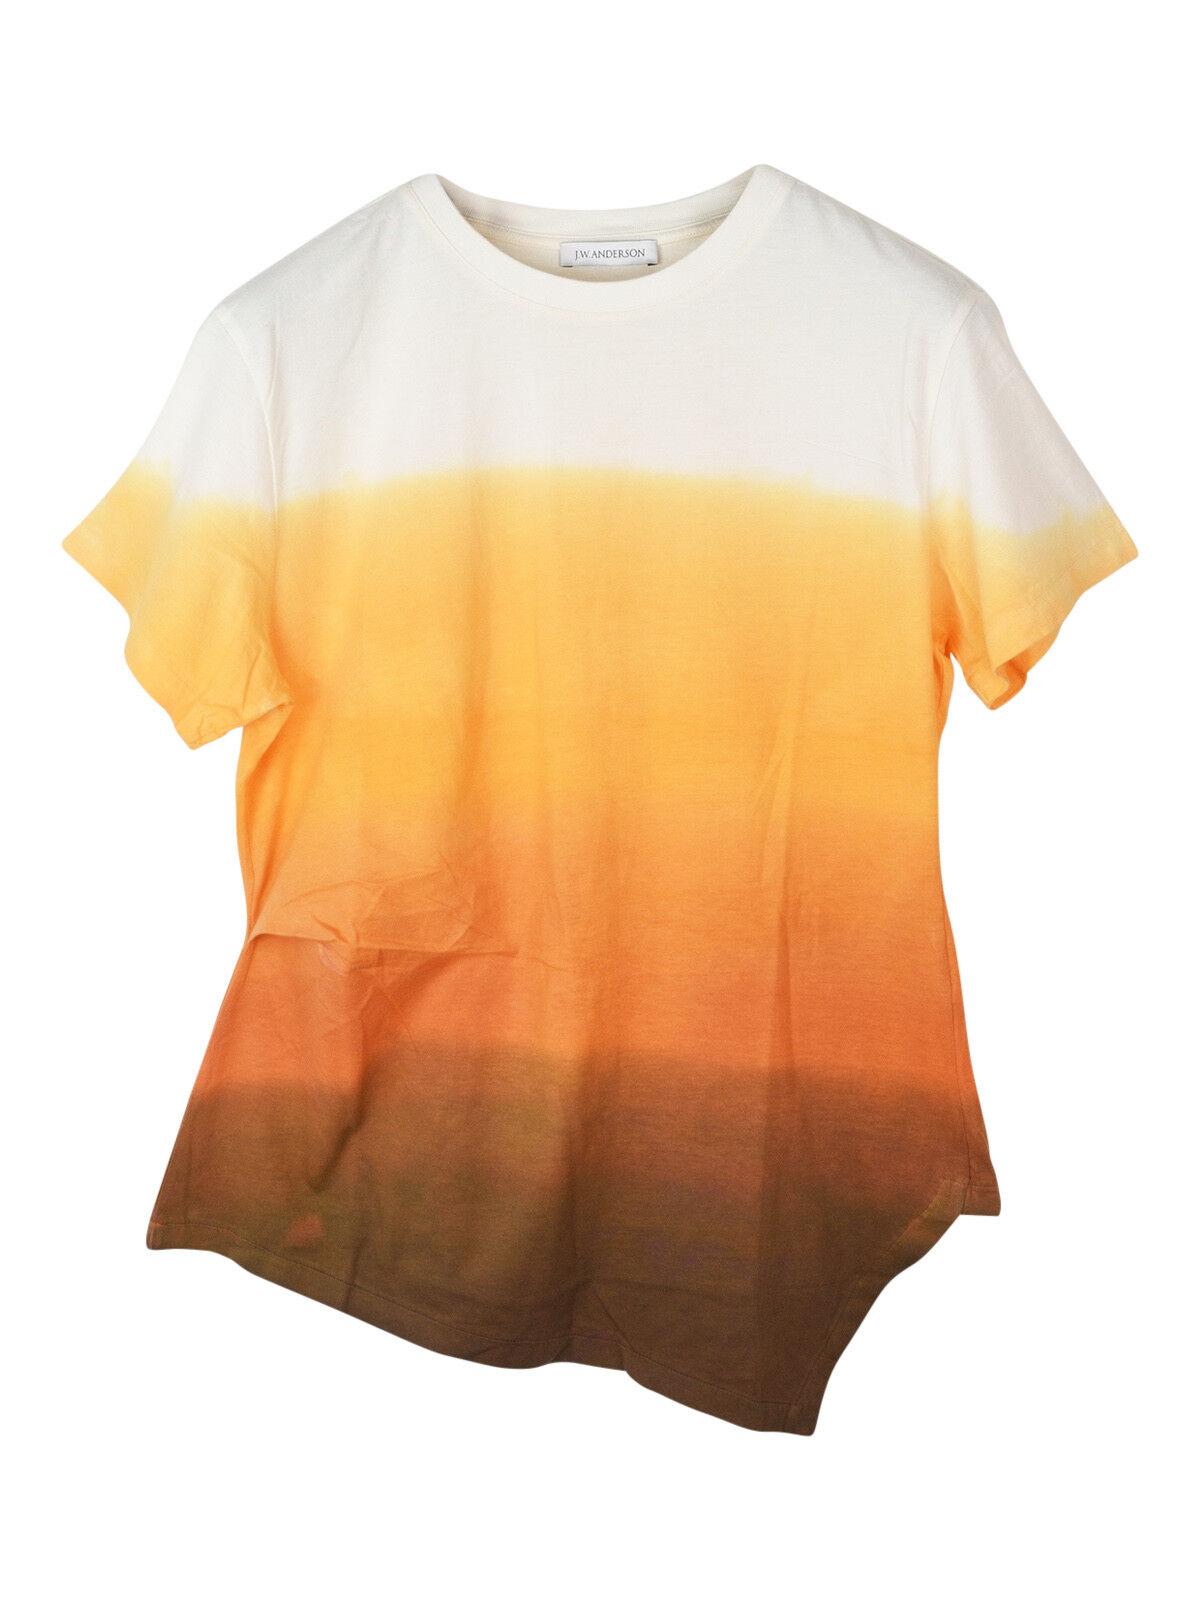 J.W. Anderson side drape T-shirt